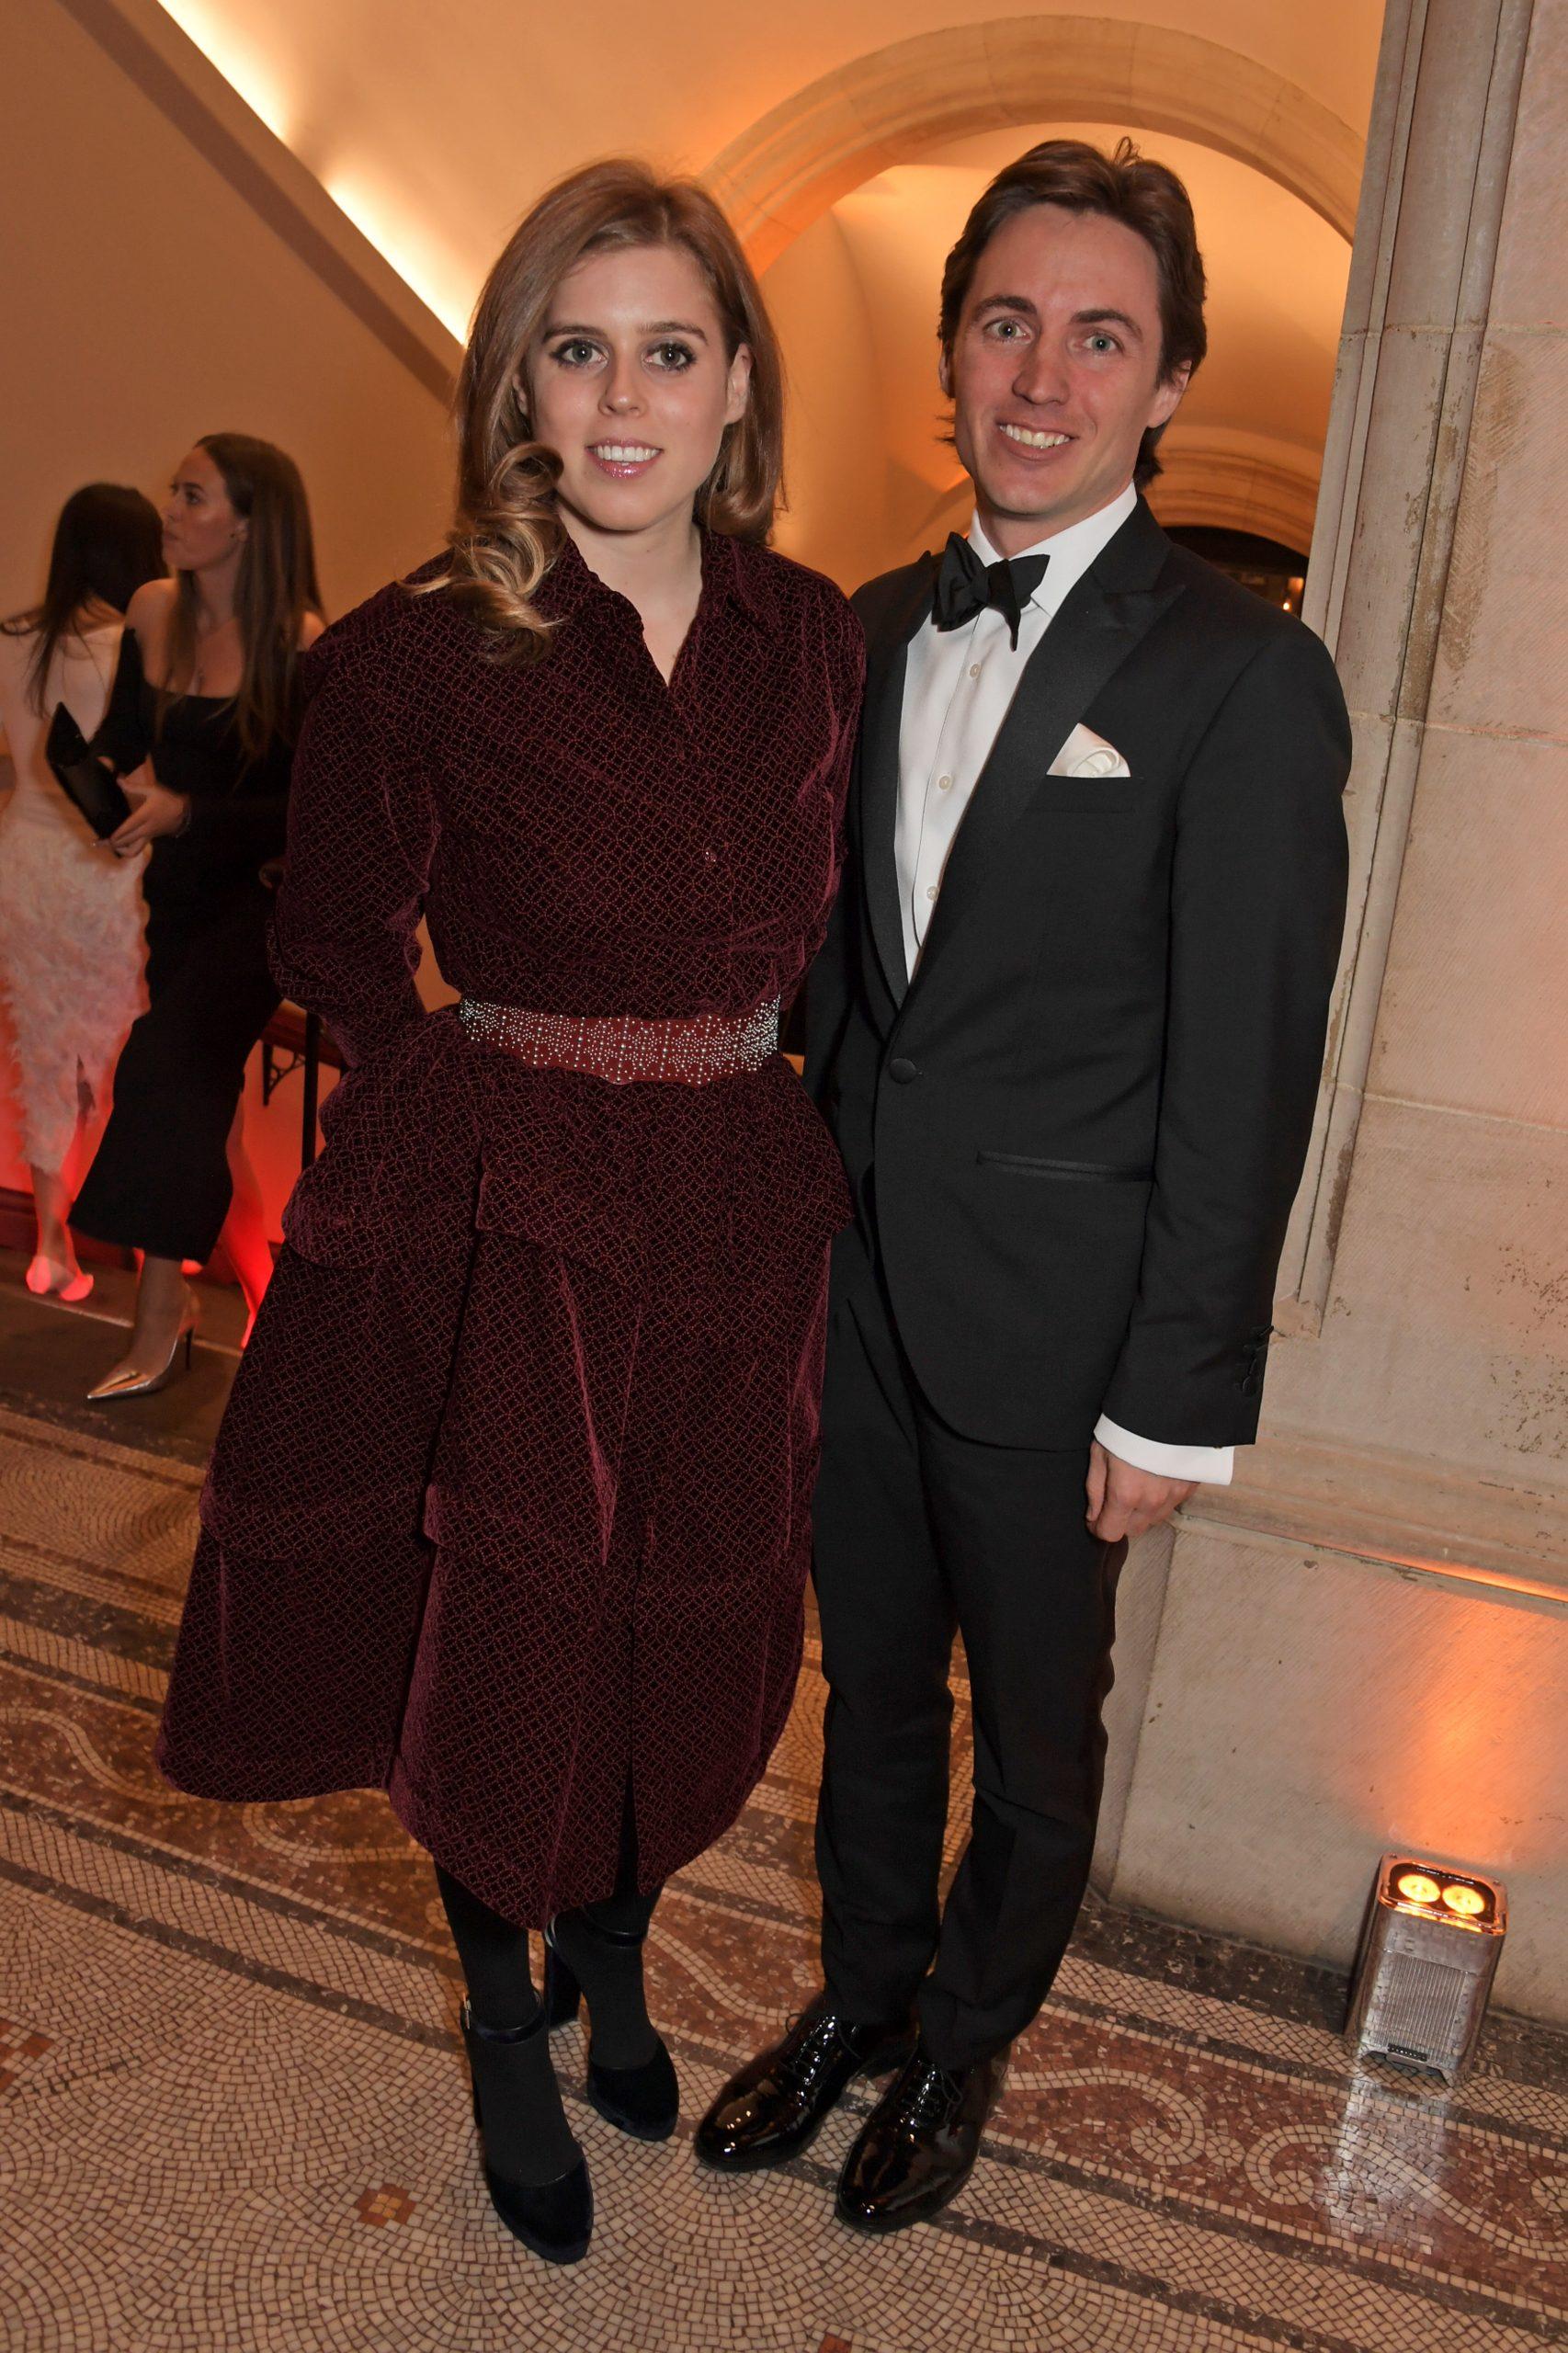 La princesse Beatrice et Edoardo Mapelli Mozzi